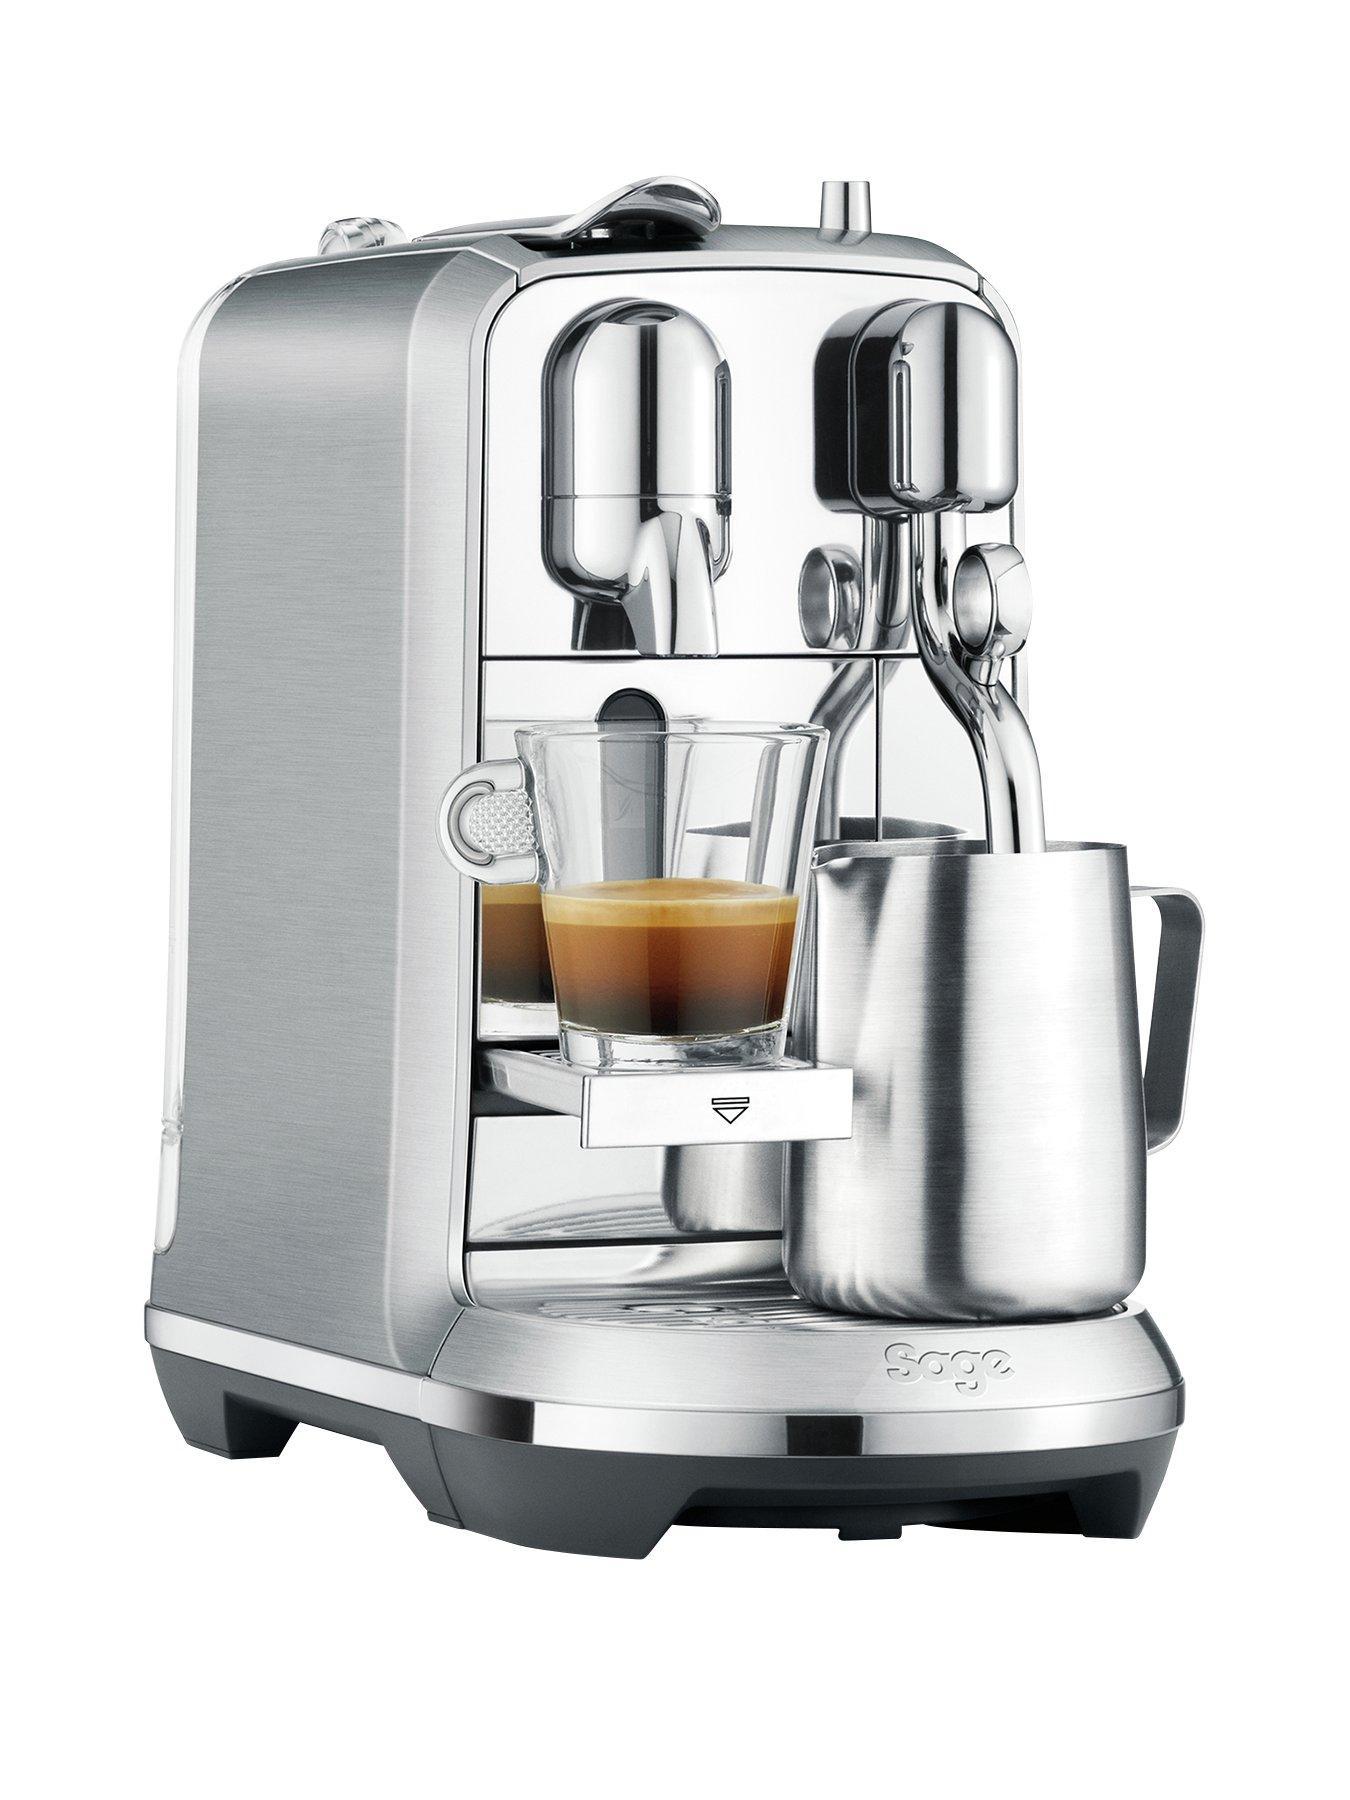 Nespresso The Creatista Plus Coffee Machine By Sage   Stainless Steel Design Inspirations